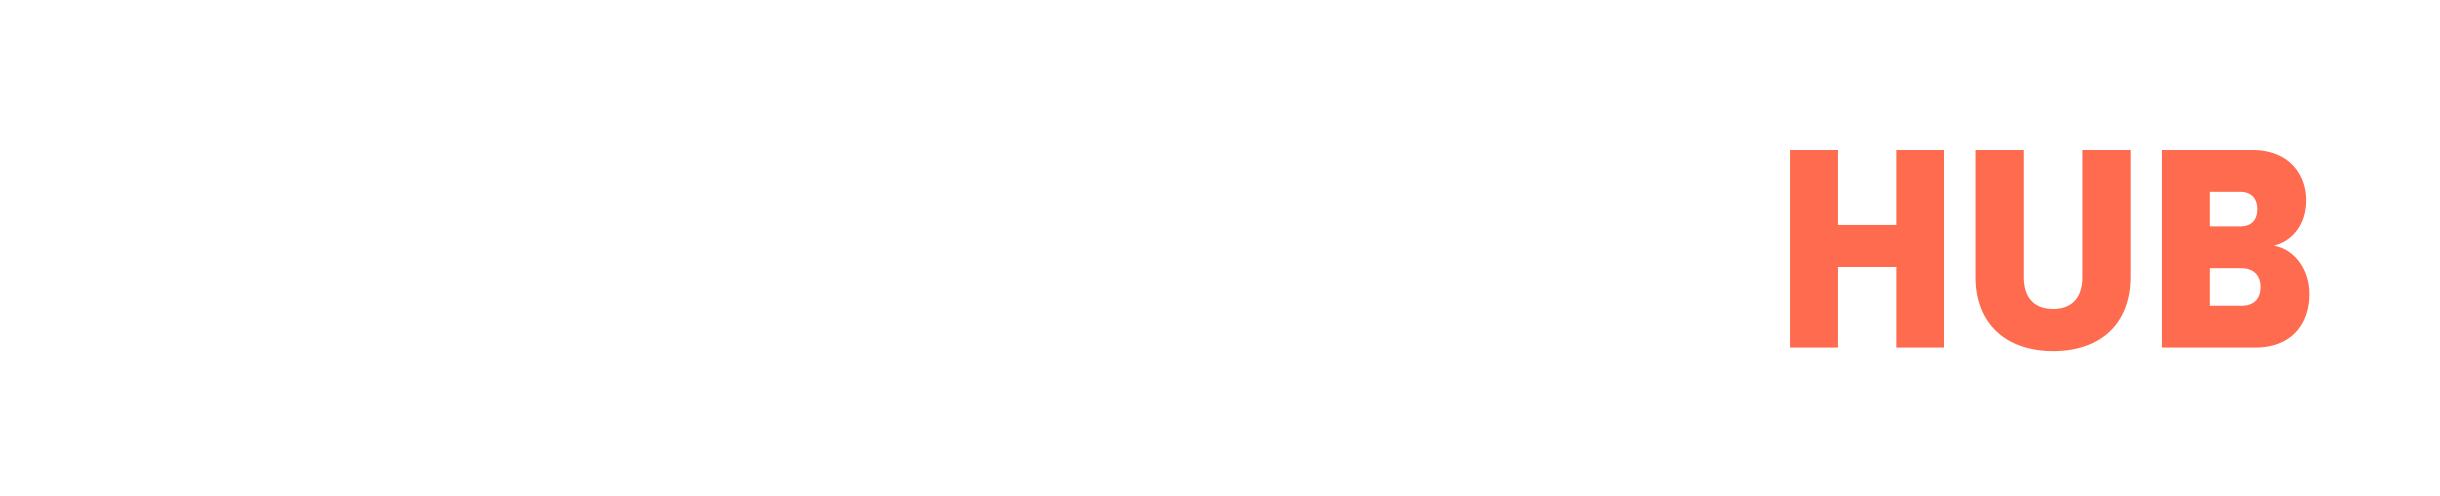 immihub_logo_v4.png